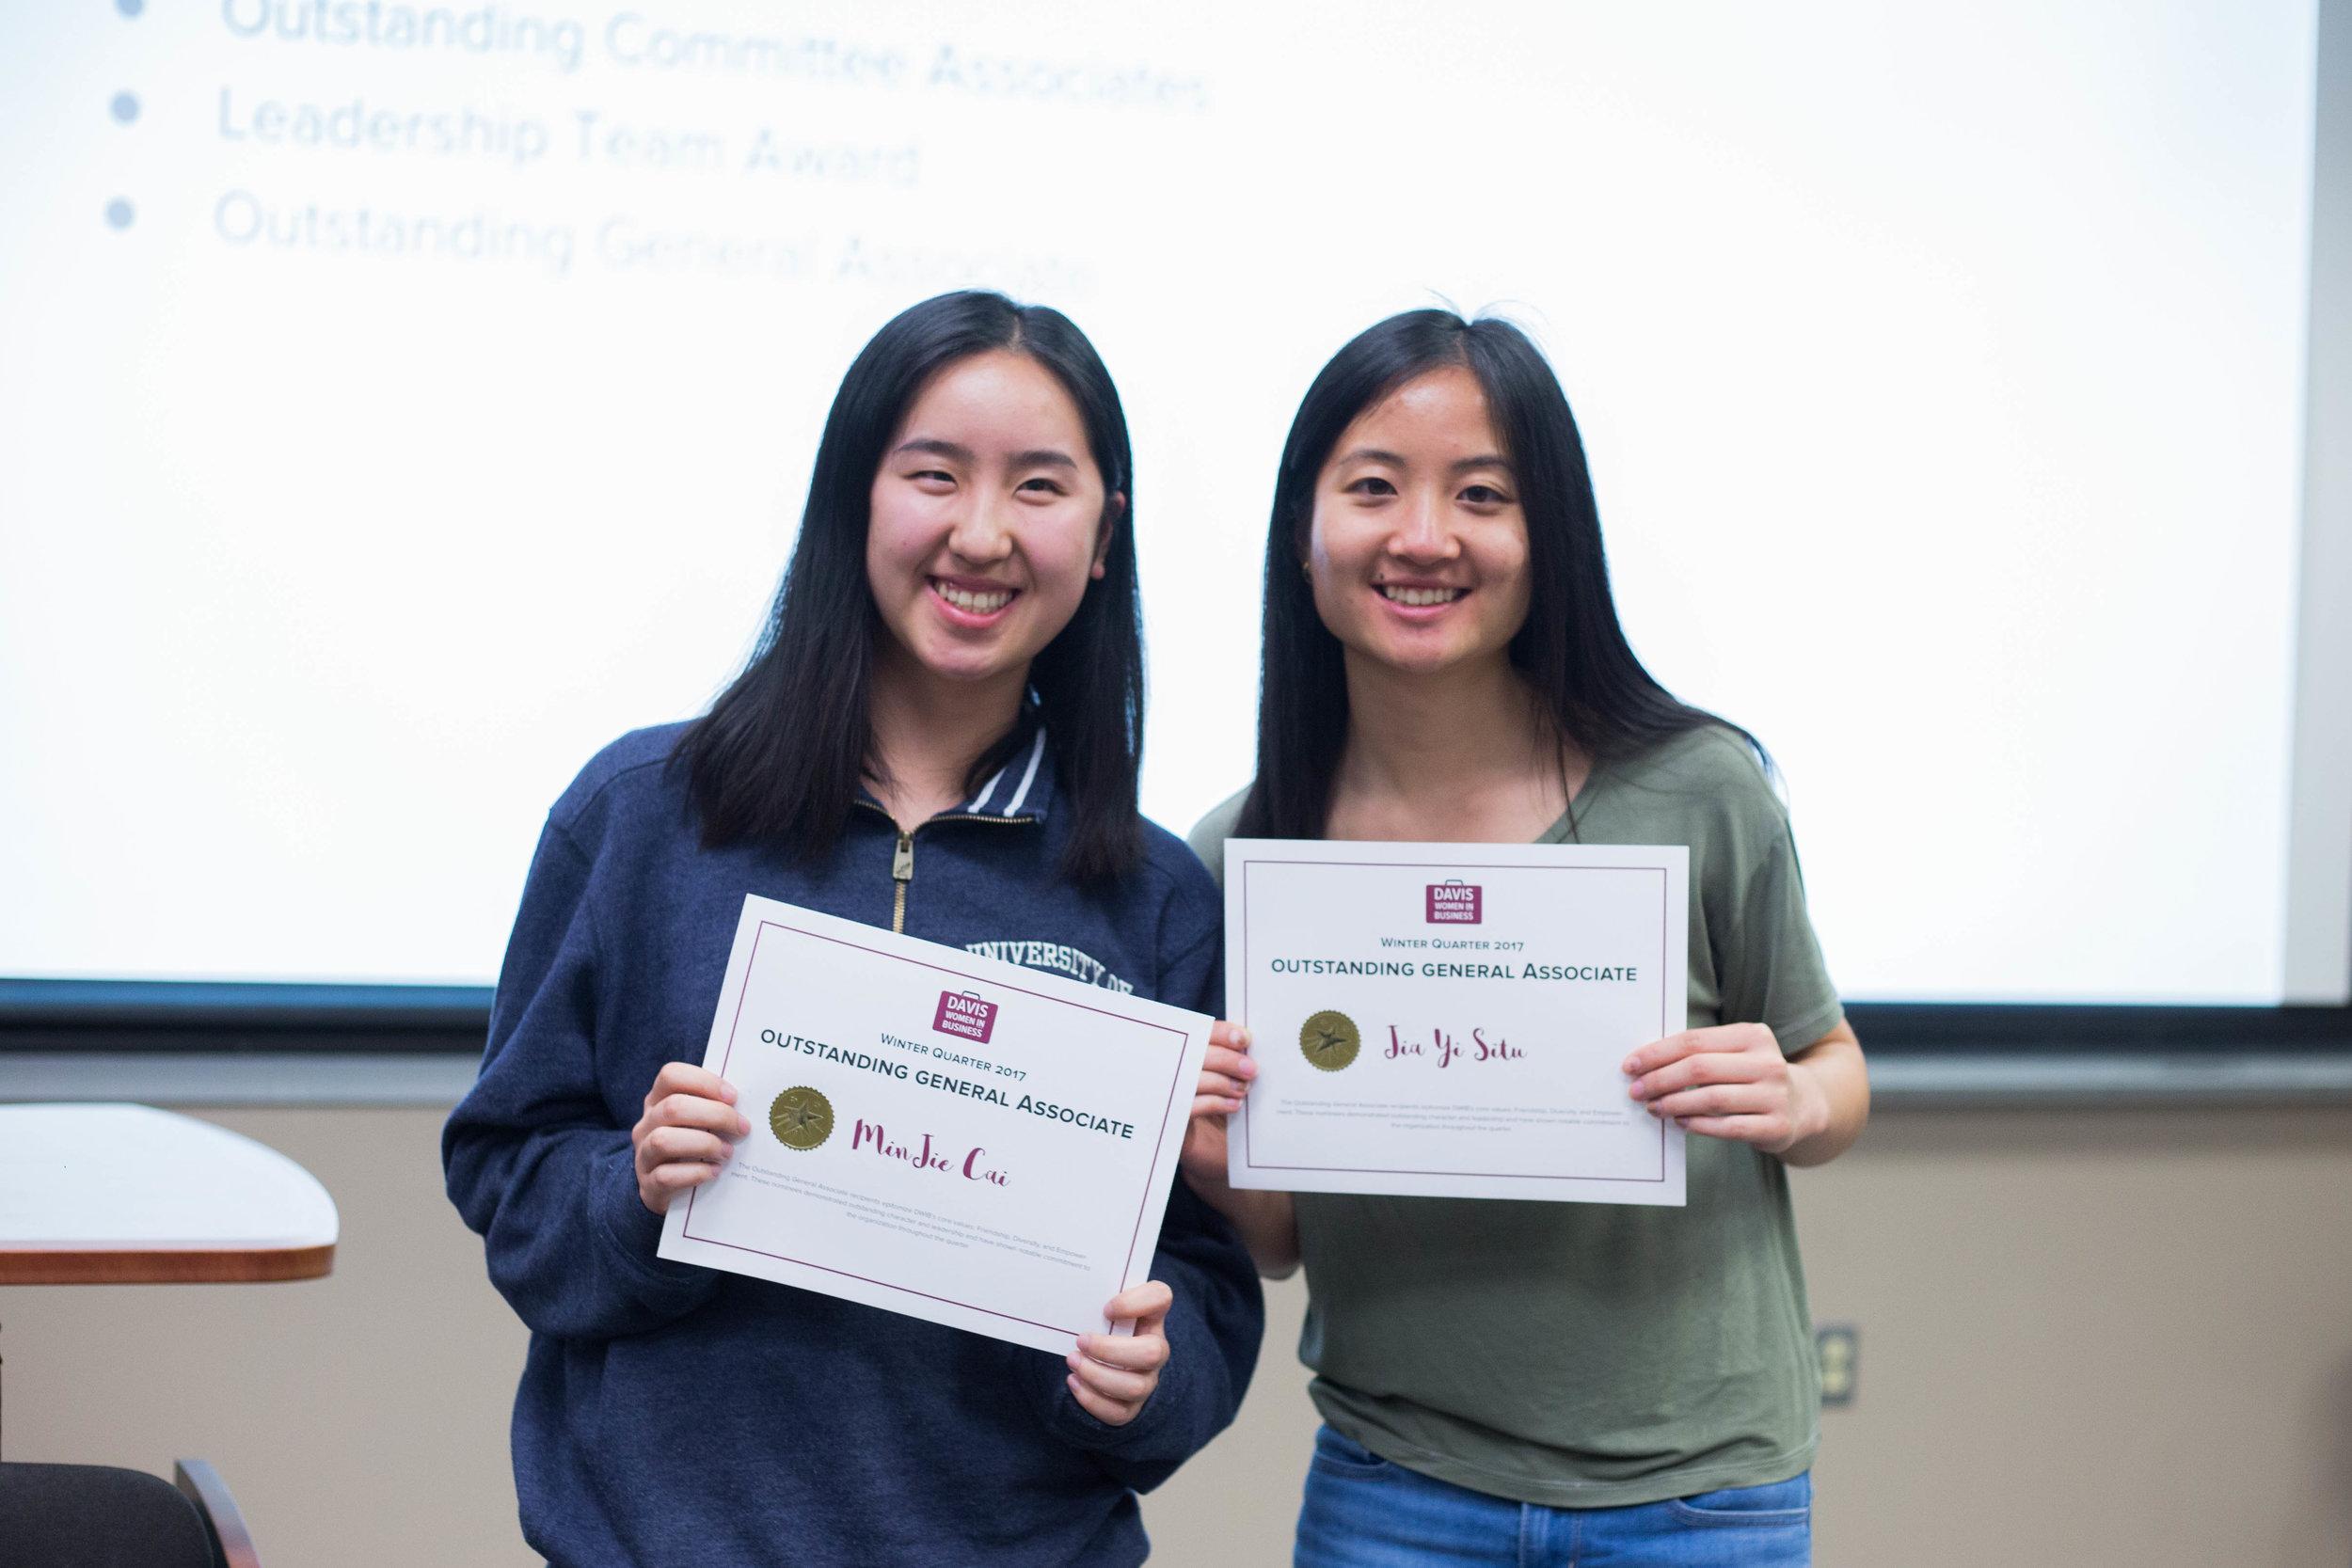 MinJie and Jia Yi, recipients of Winter Outstanding General Associate